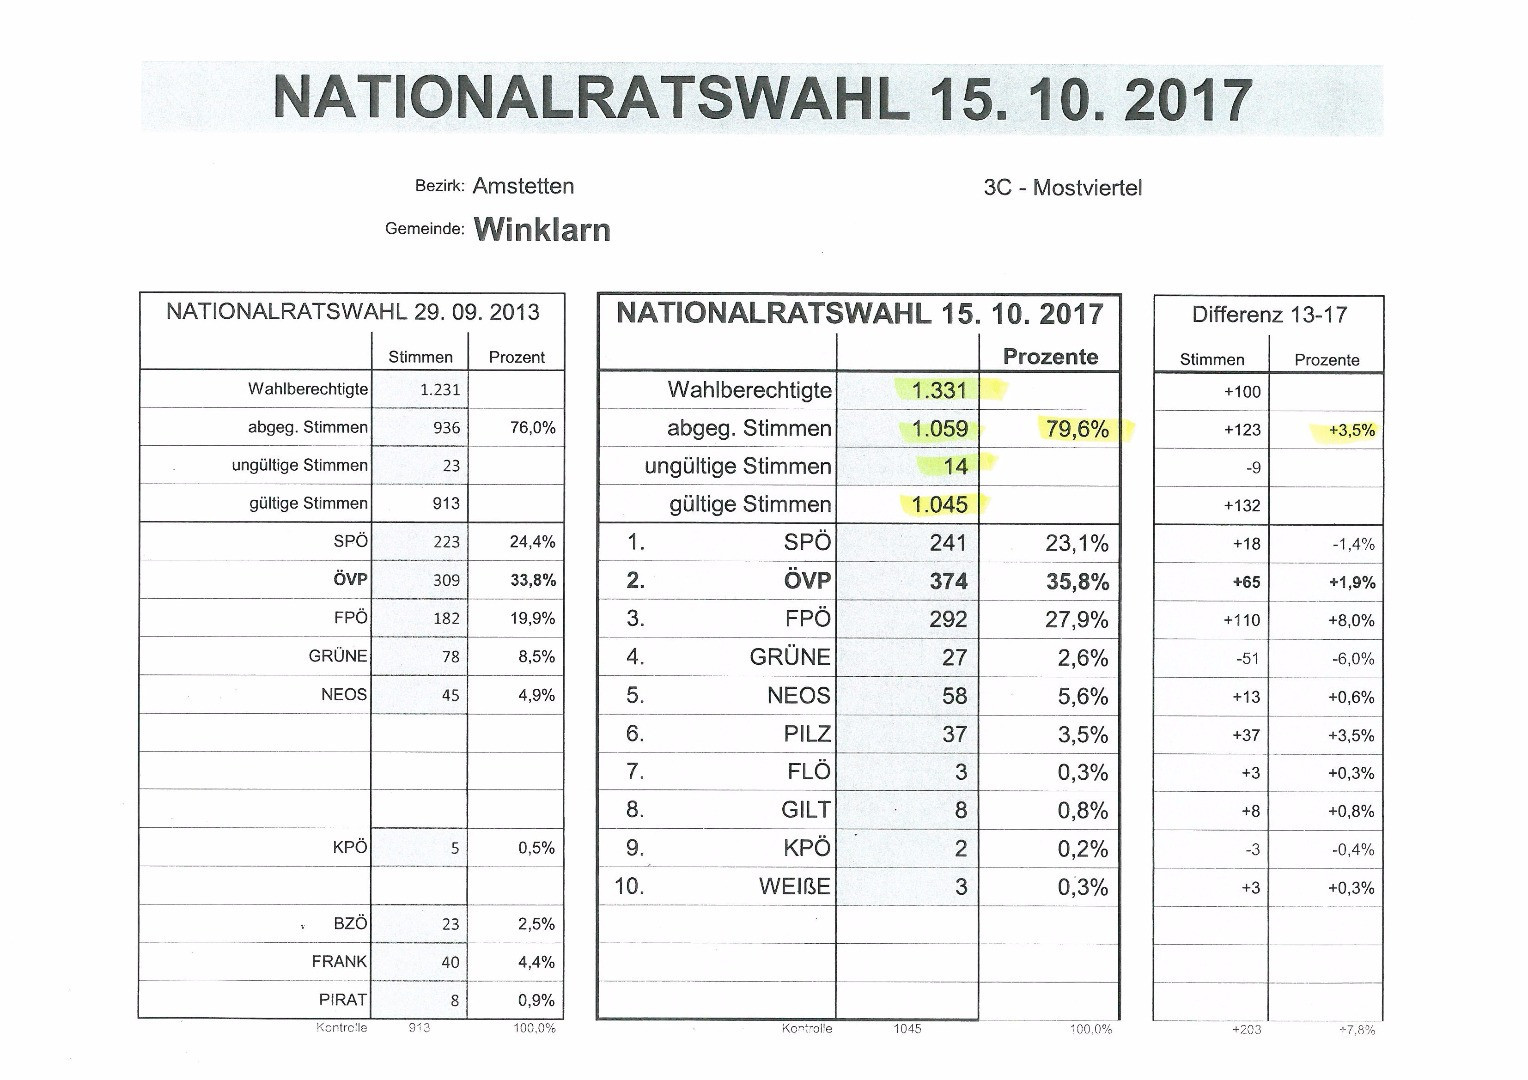 Wahlergebnis Winklarn NRW_17.jpg